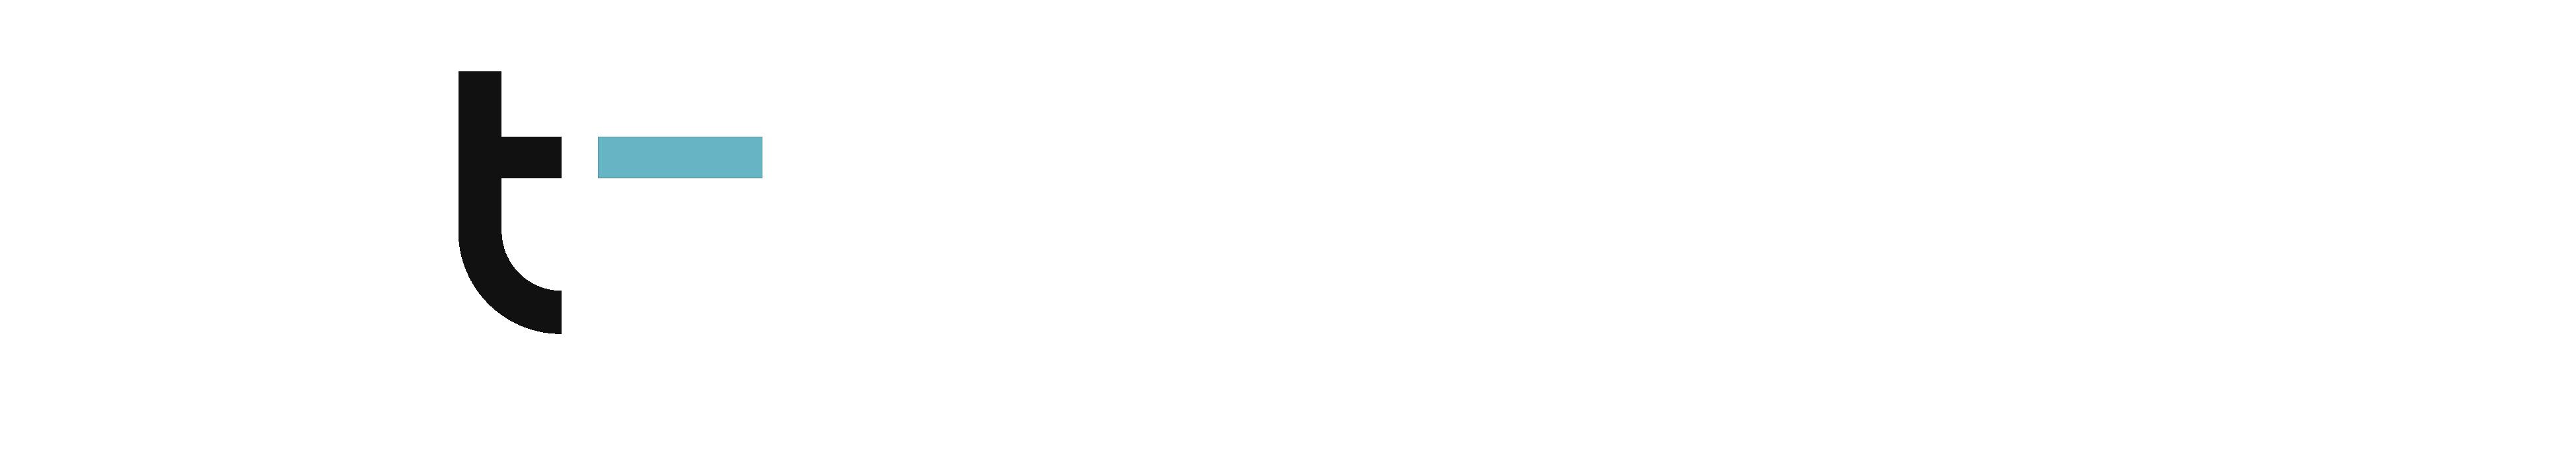 Tecnoprint Srl